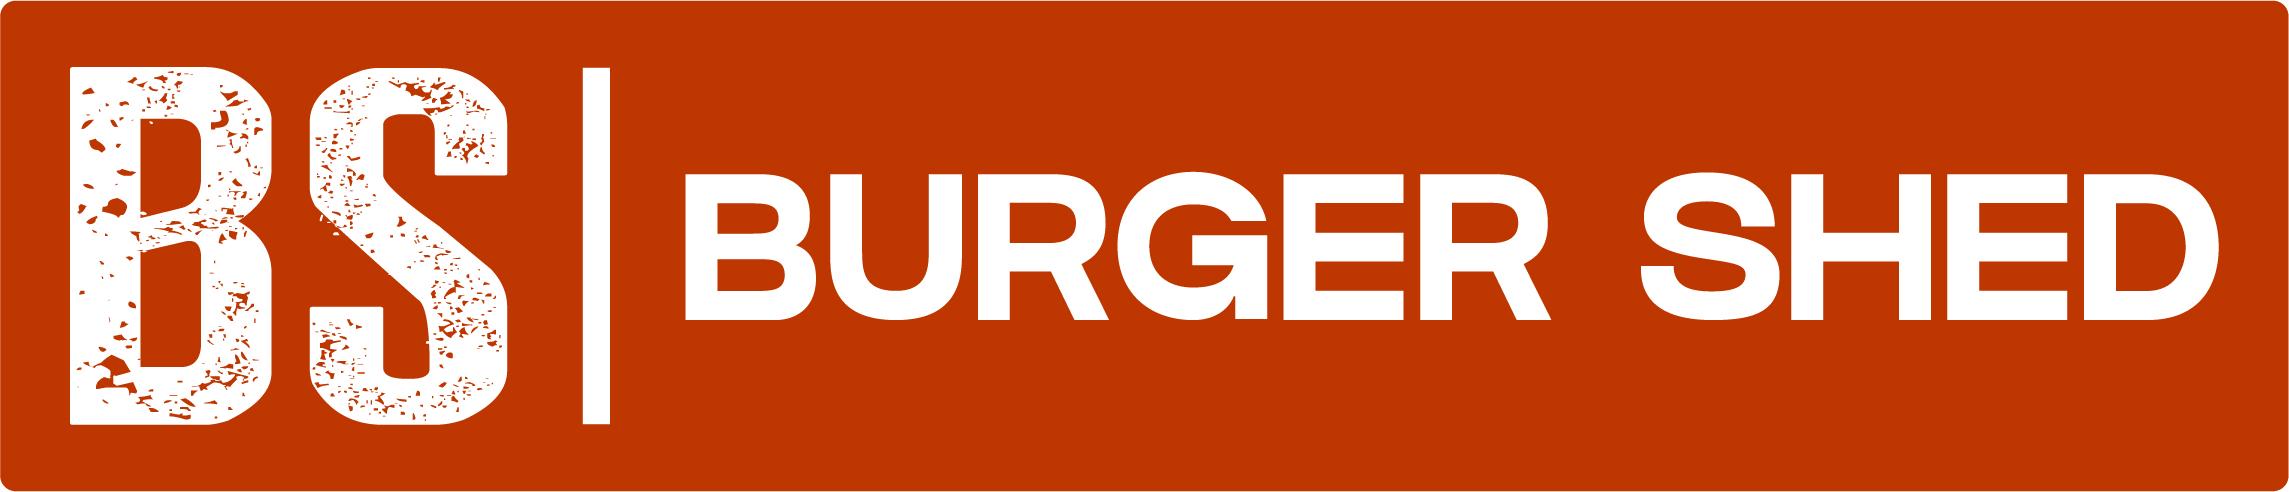 Burger Shed Horizontal Logo